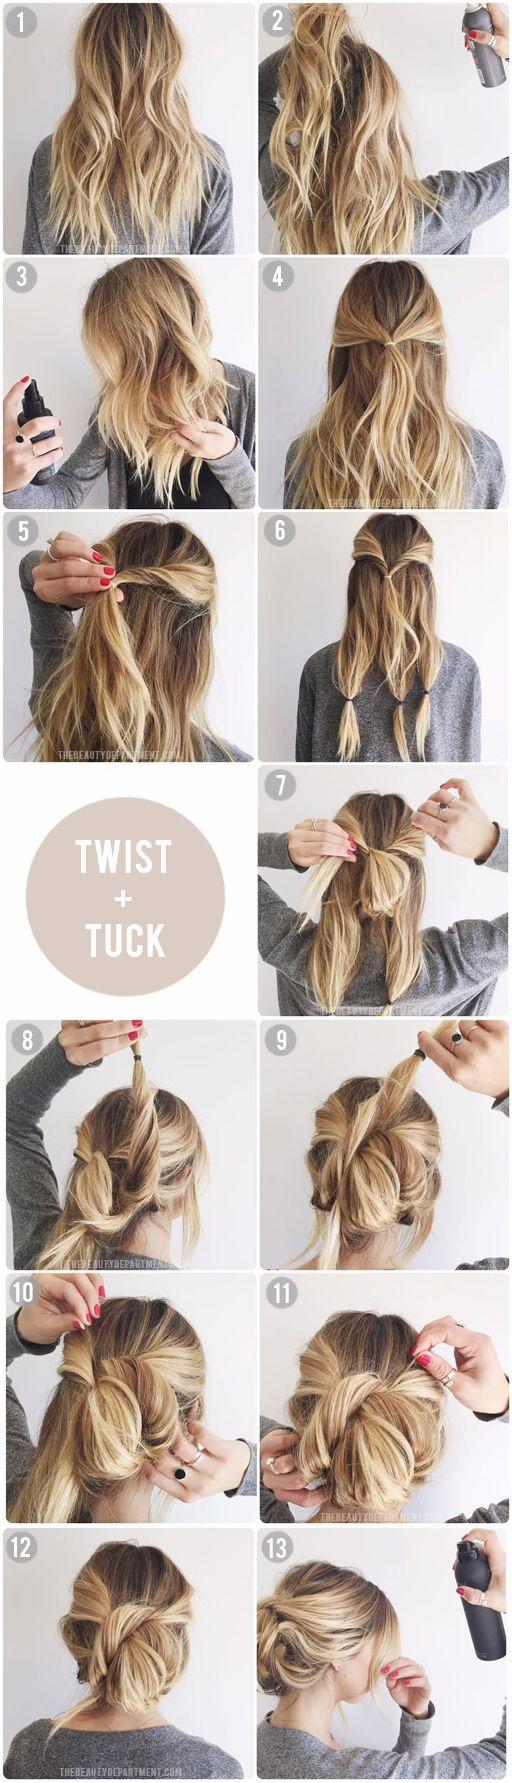 60 Easy Step by Step Hair Tutorials for Long, Medium,Short ...